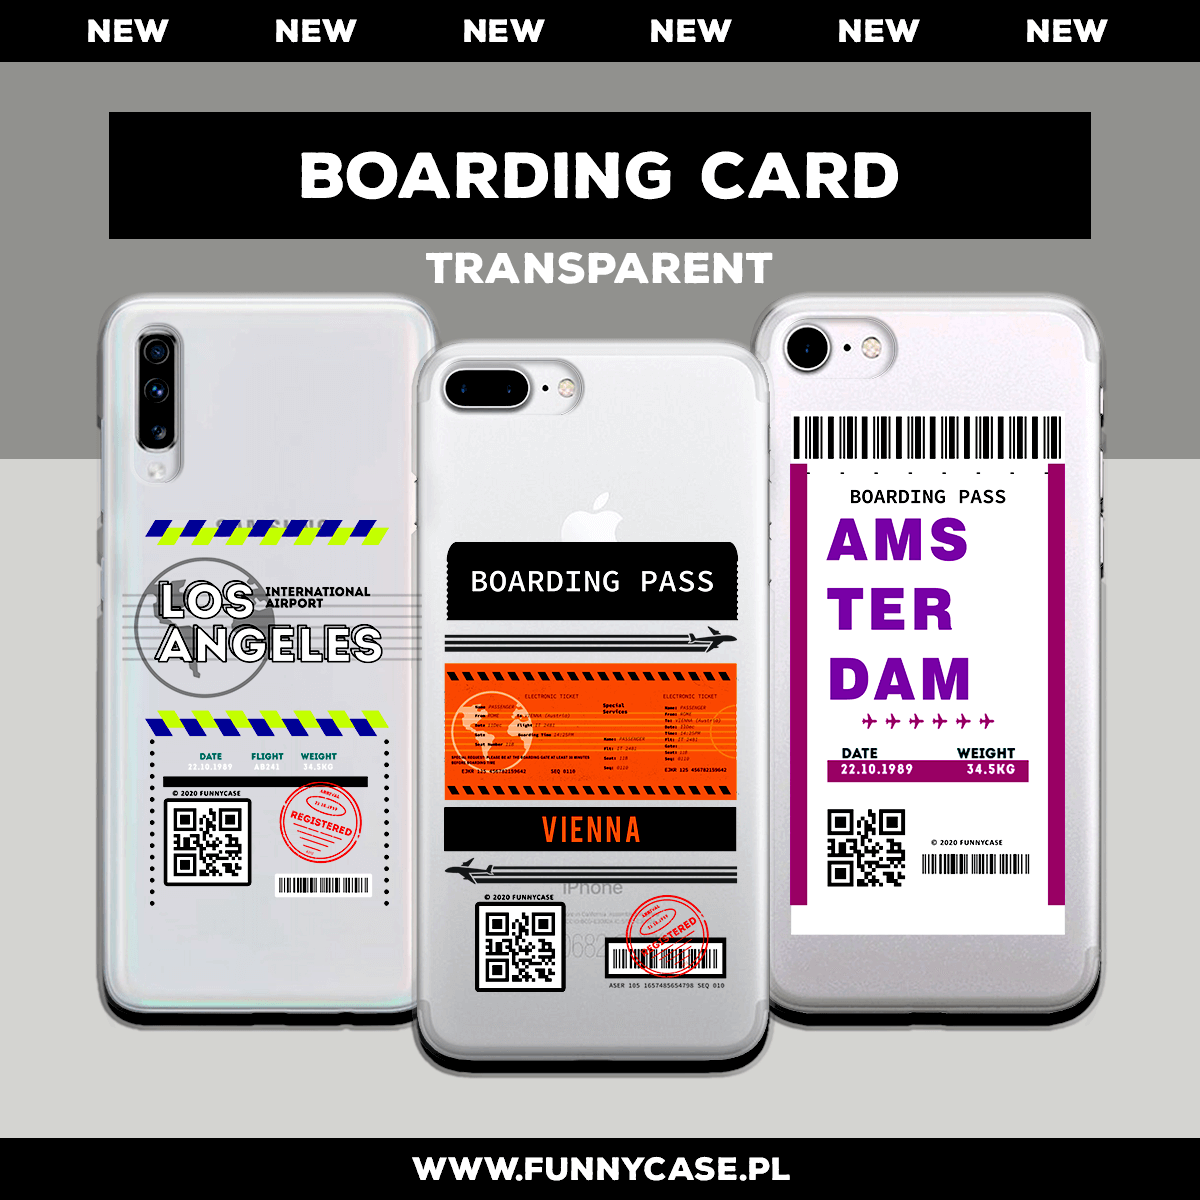 Boarding Card Transparent